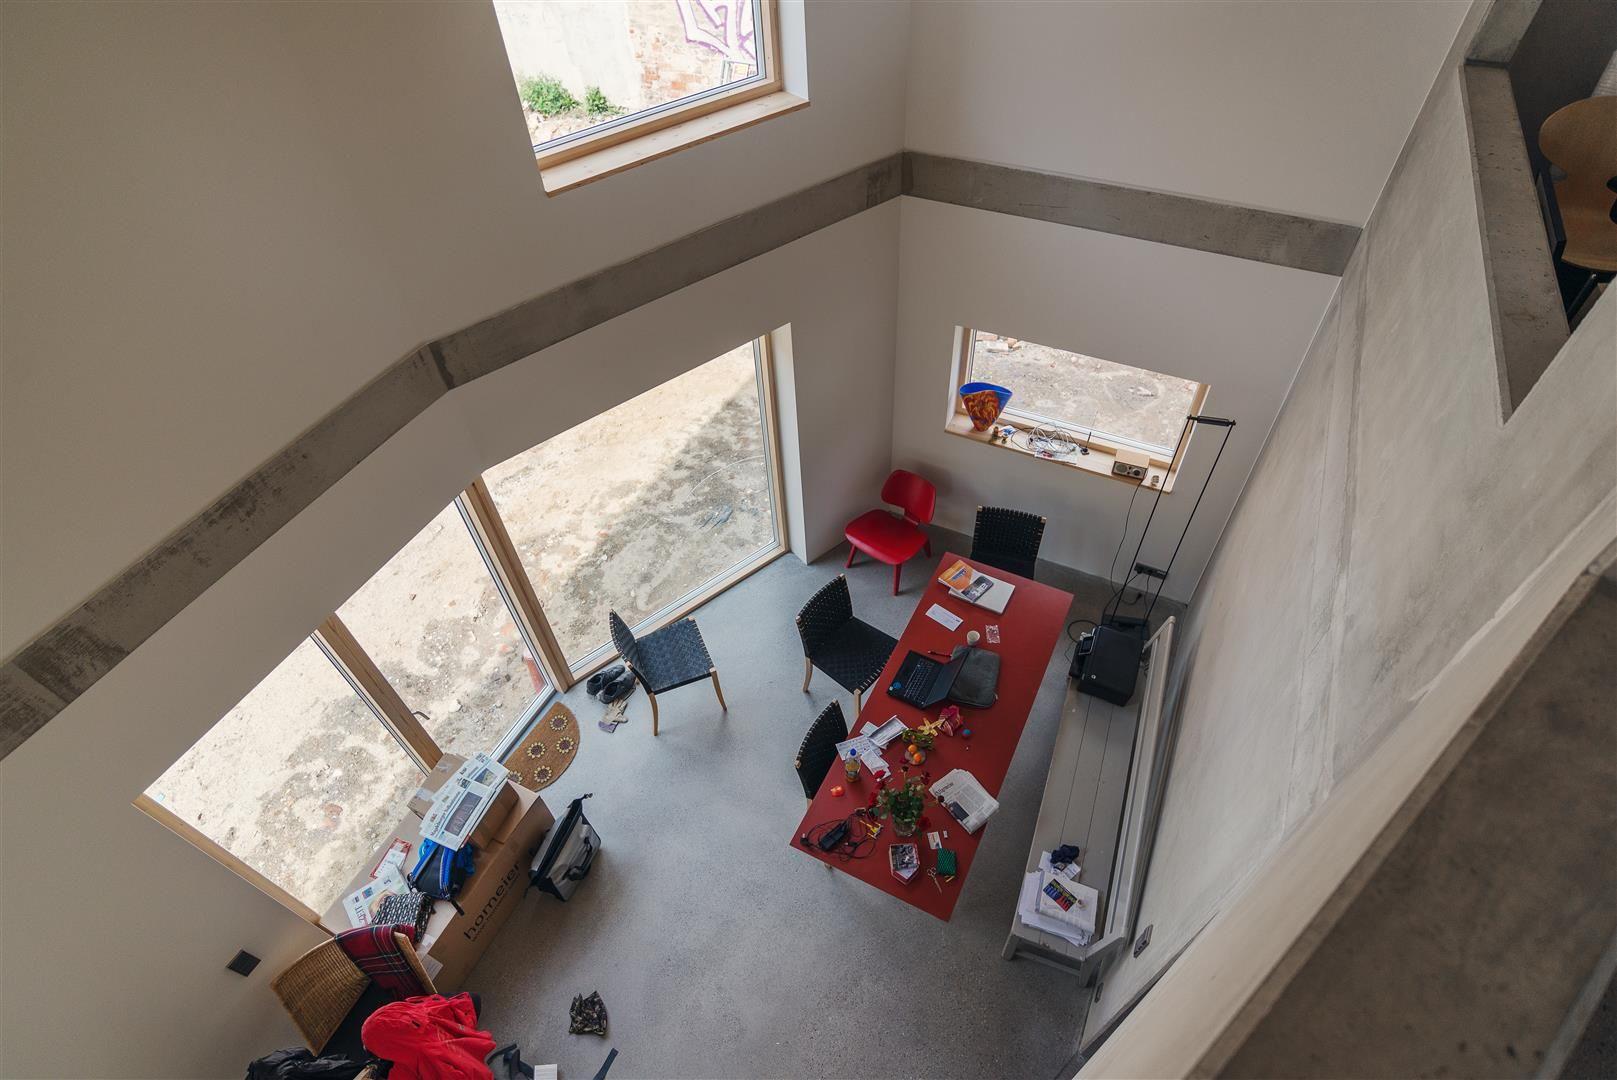 Sichtbeton, Terrazzo, Holz, Stadthaus, Einbaumöbel Neubau ...